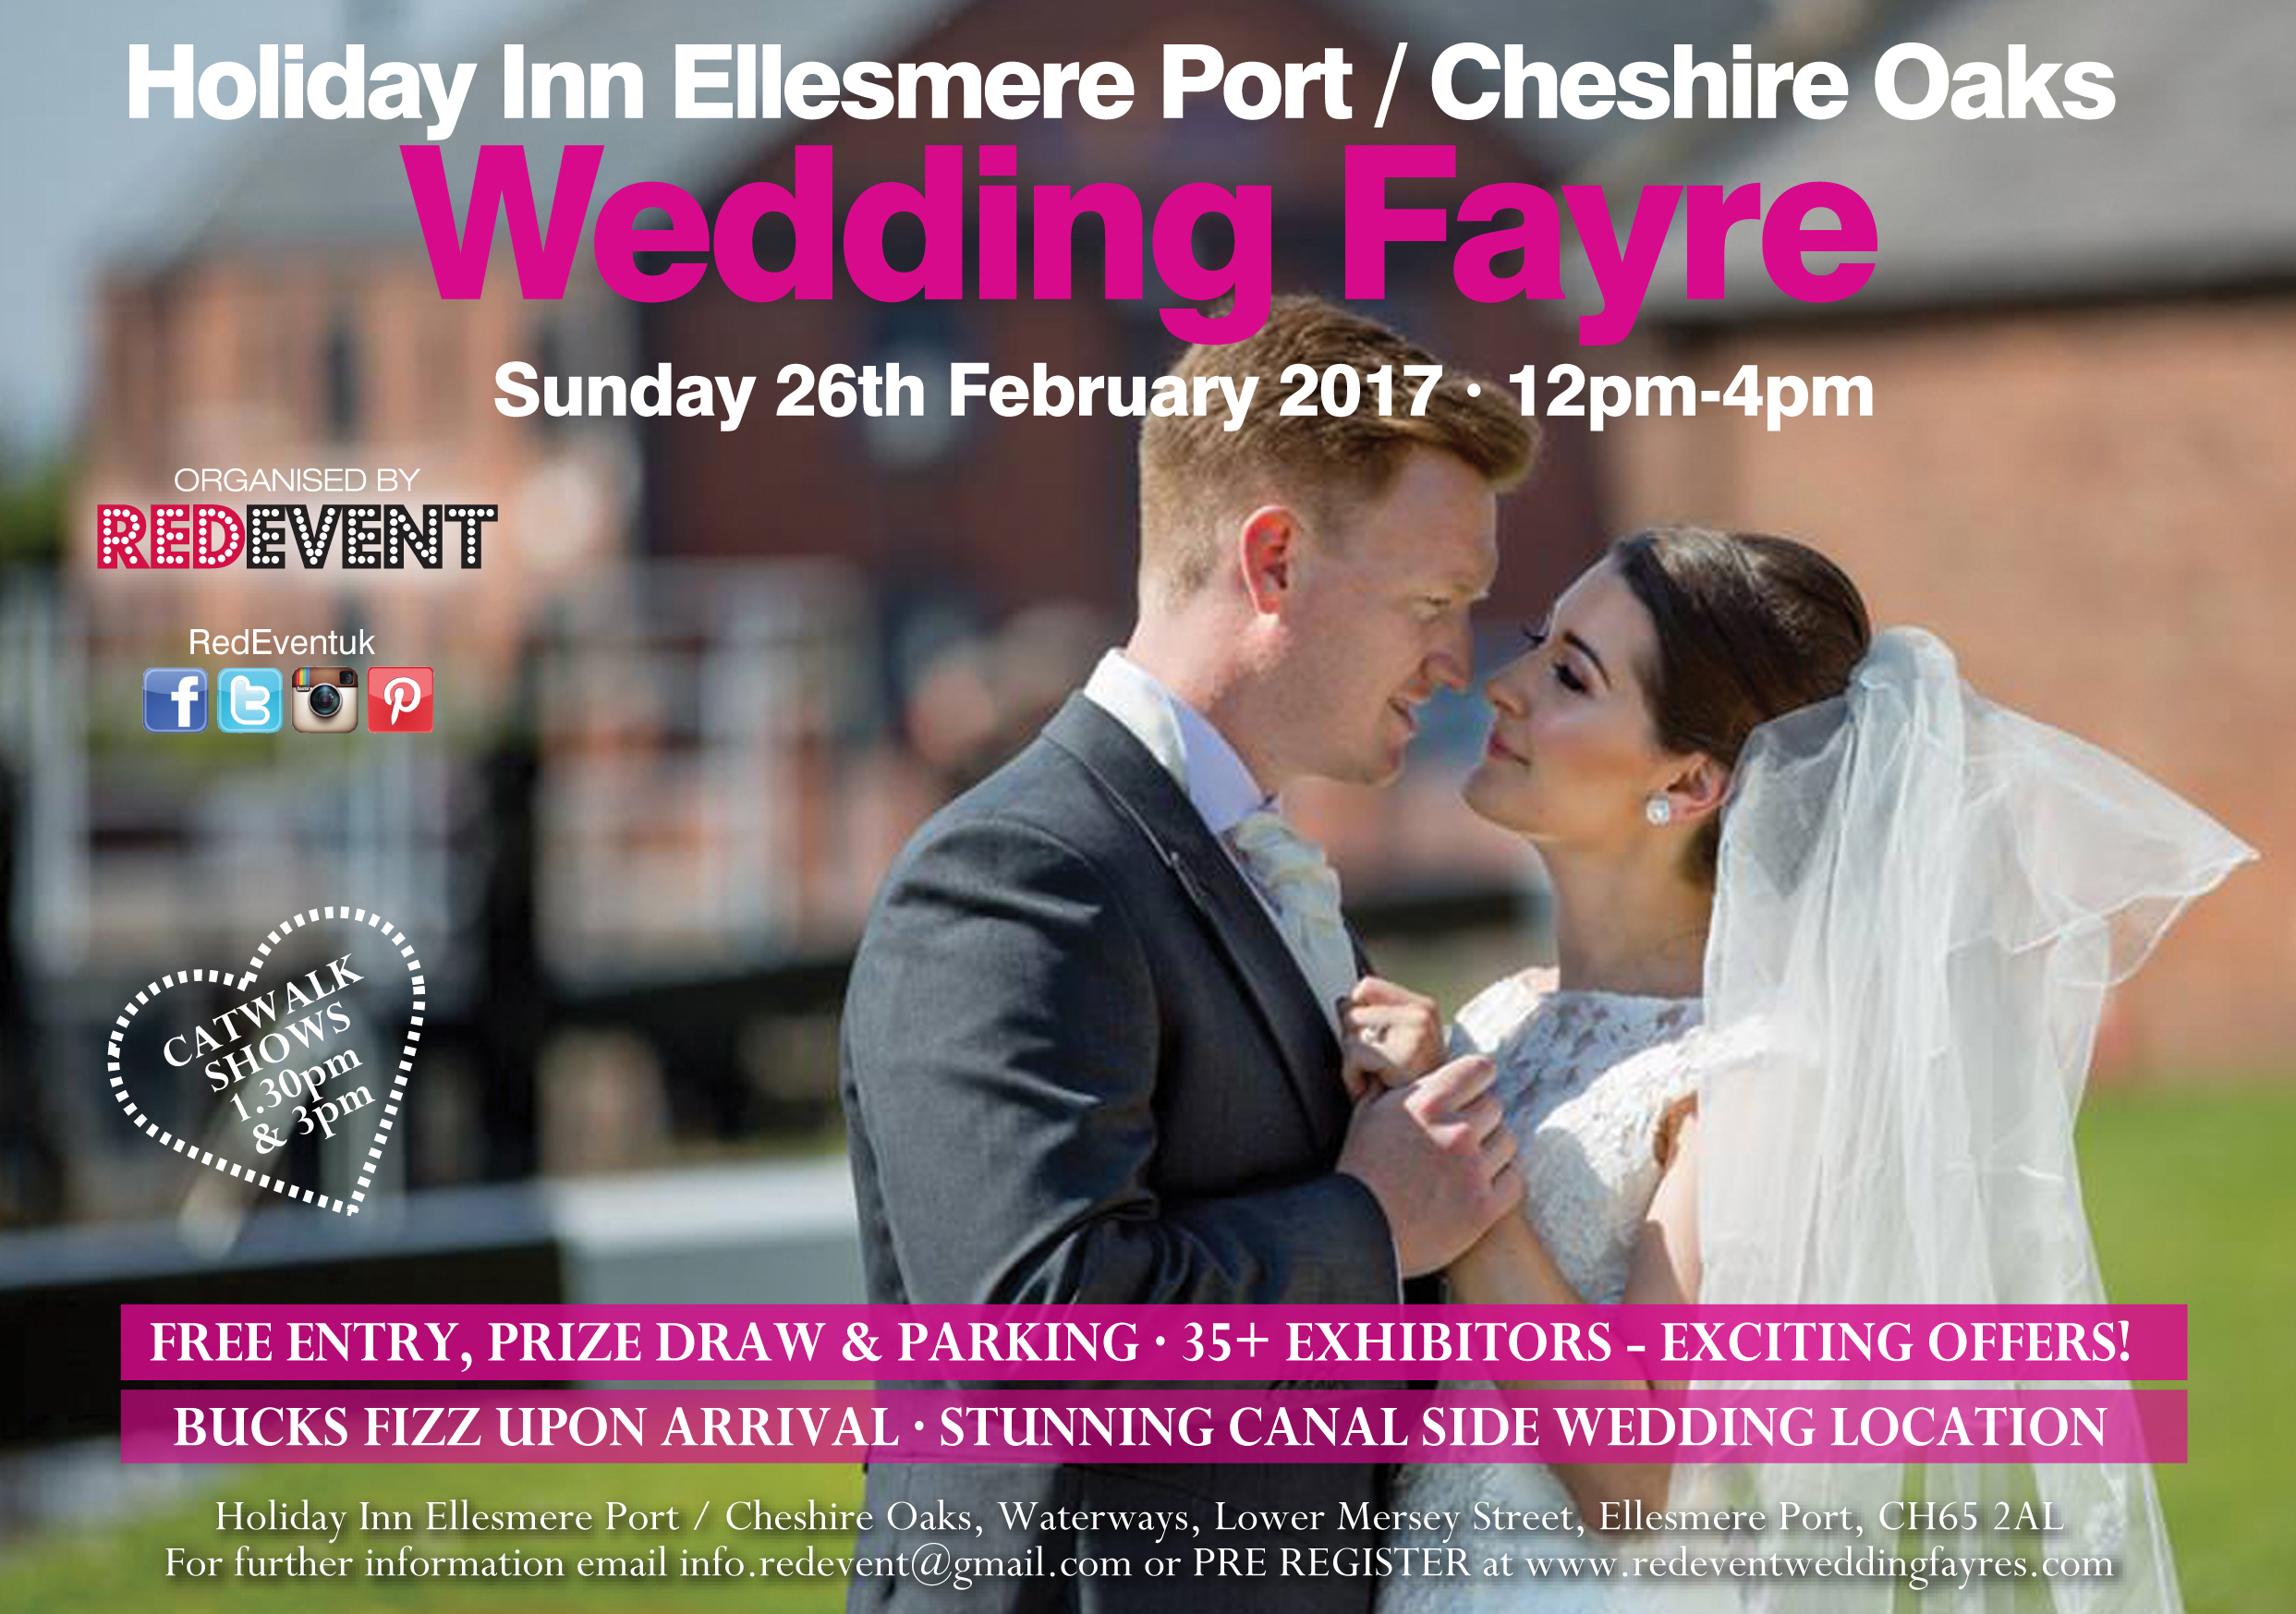 Holiday Inn Ellesmere Port Cheshire Oaks Wirral Wedding Fayre